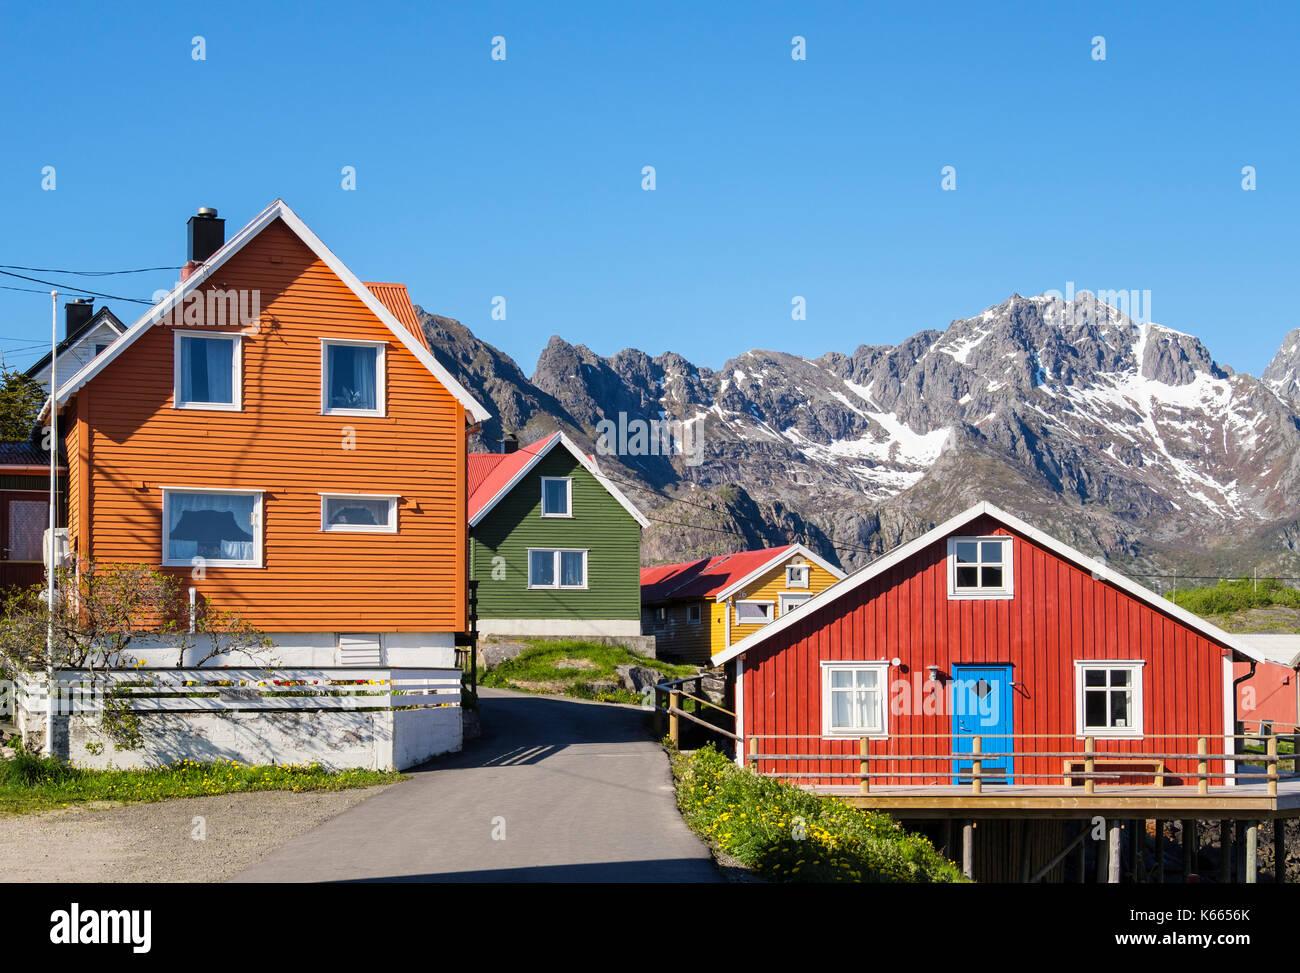 Tipico colorata architettura norvegese case di legno in Henningsvaer, Austvågøya isola, isole Lofoten, Nordland, Norvegia e Scandinavia Immagini Stock